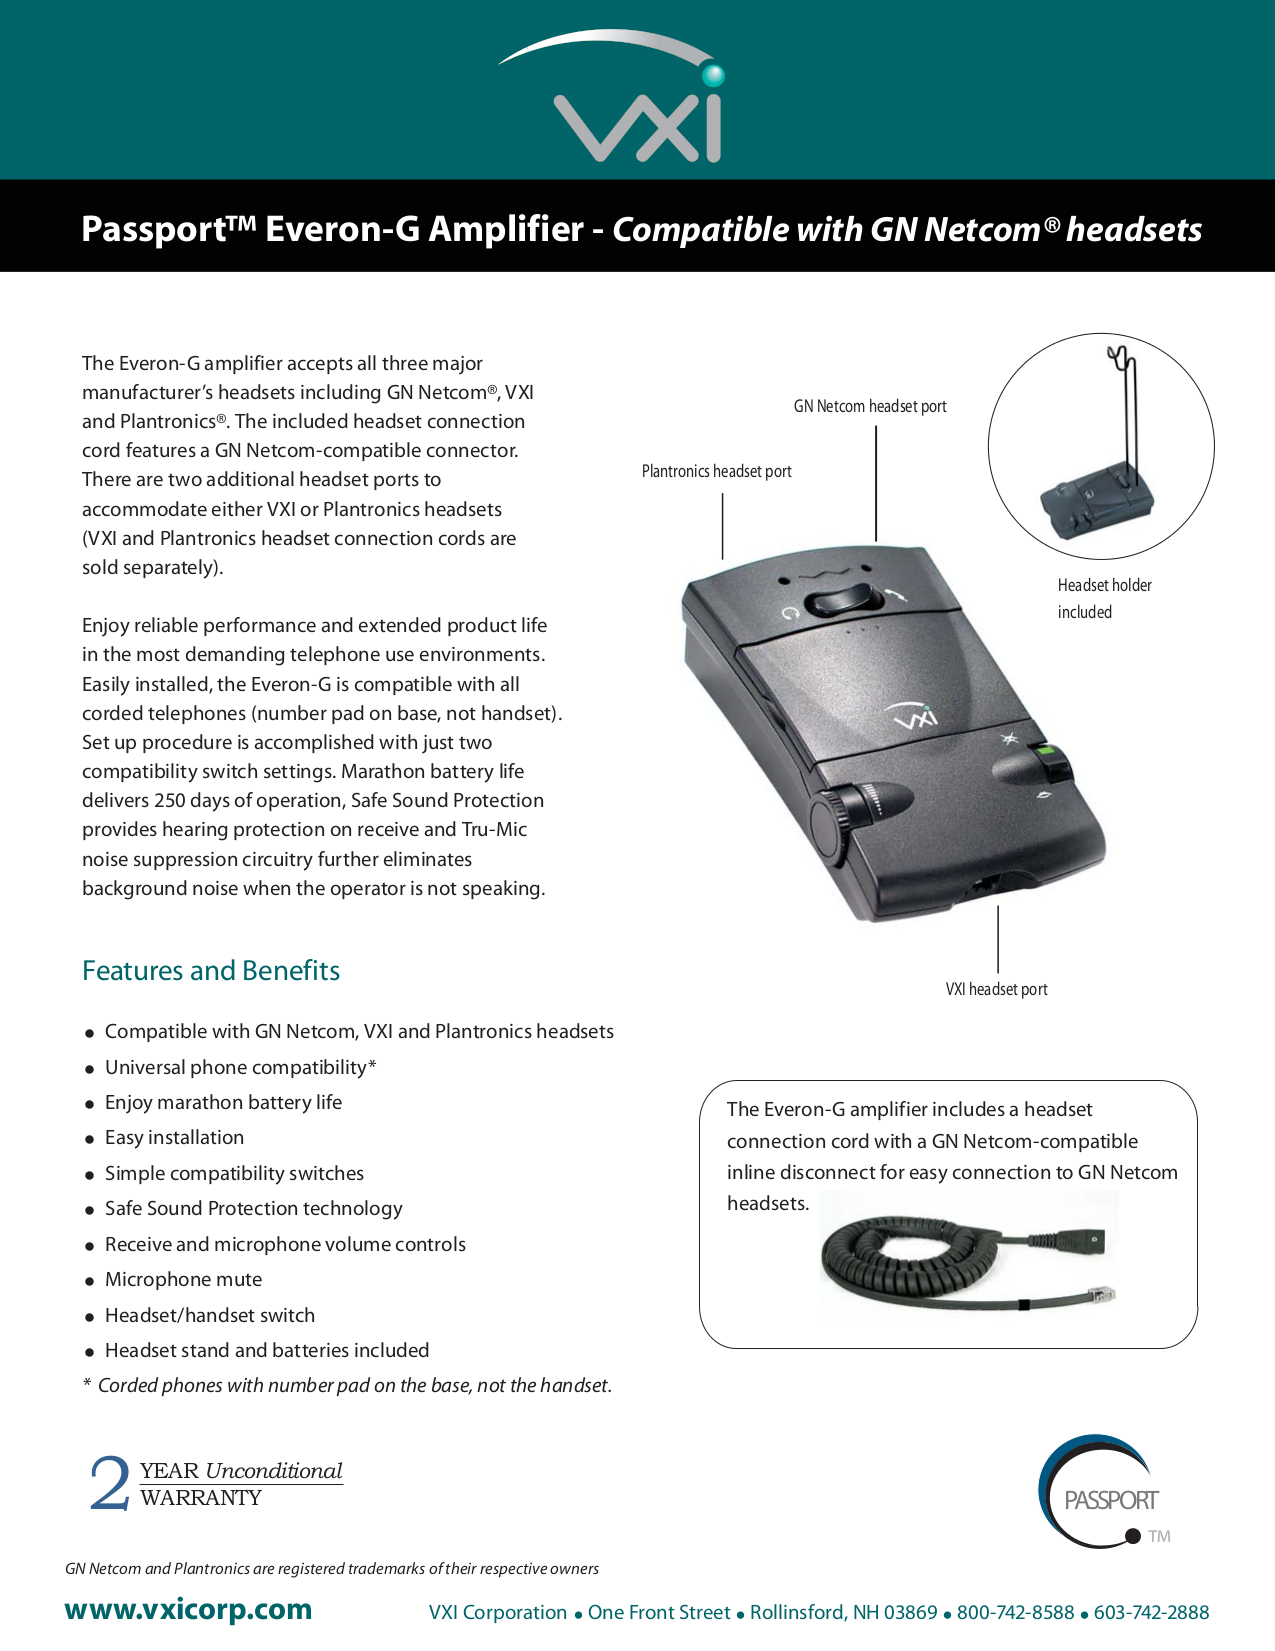 pdf for VXI Amp Passport Everon-G manual